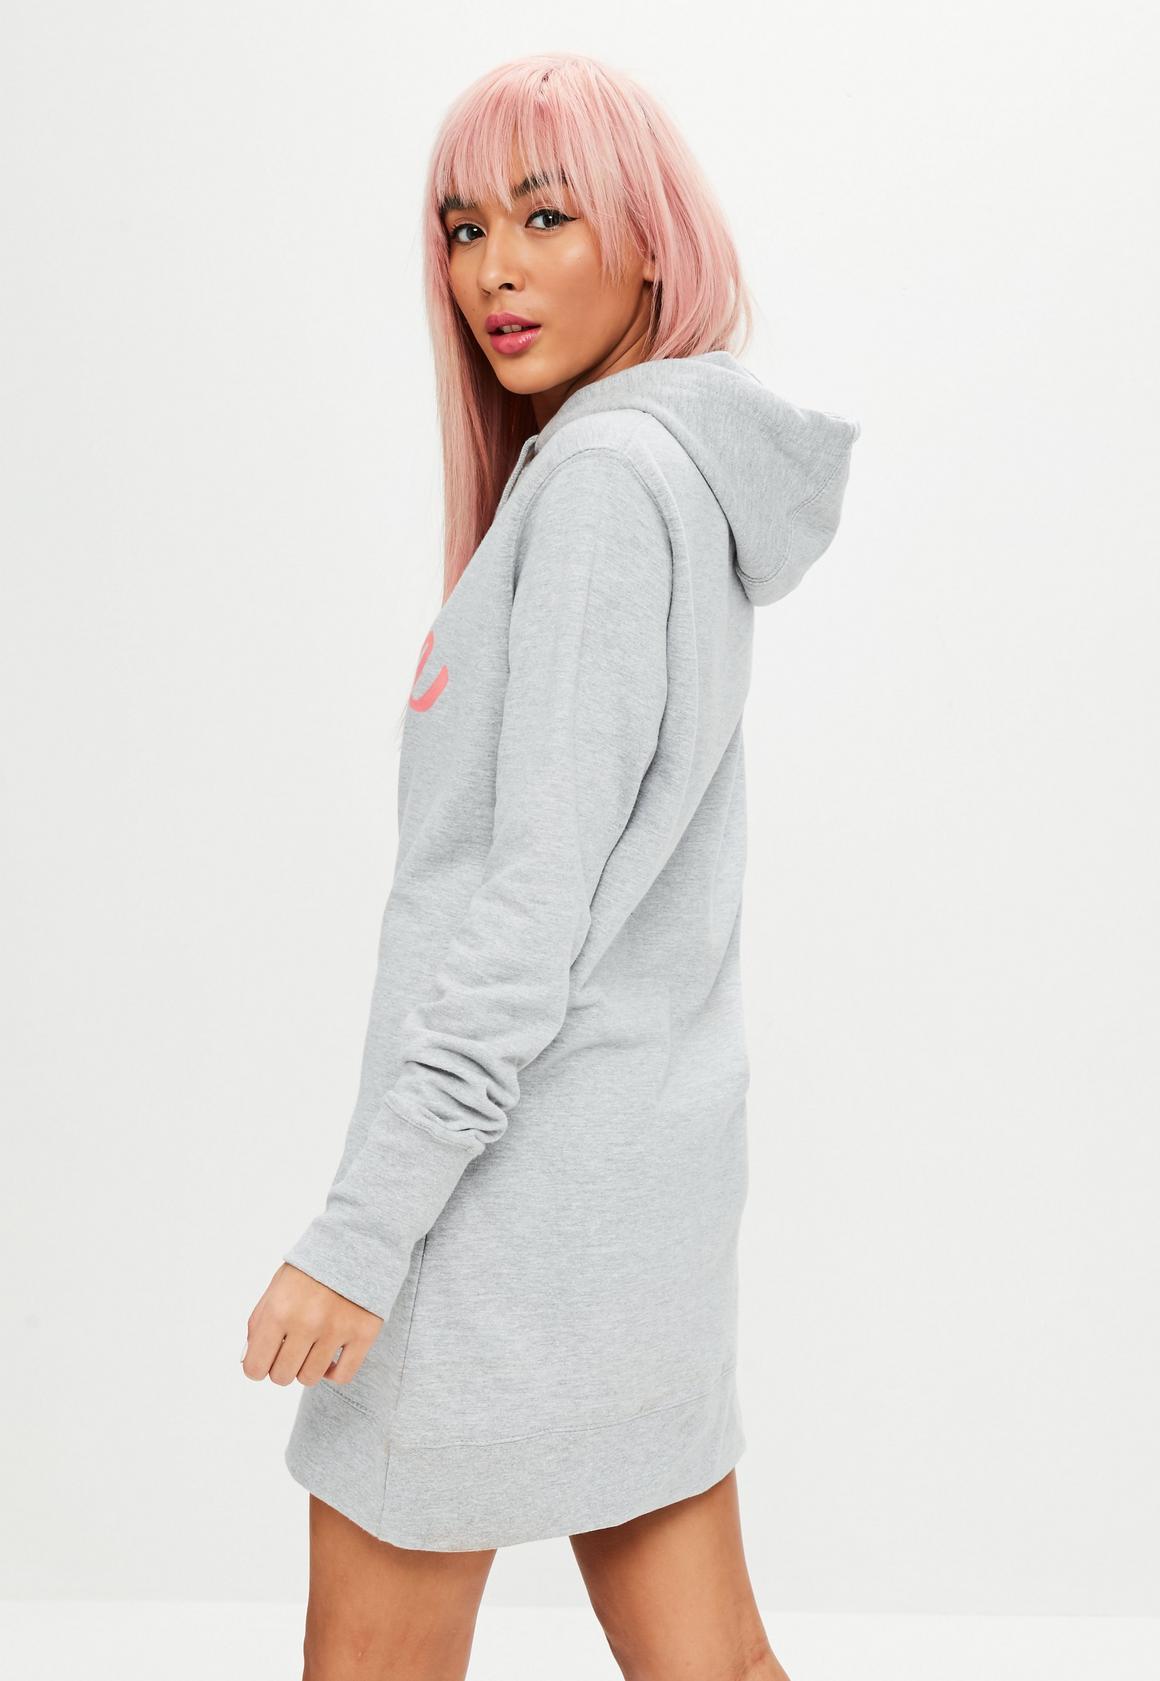 70ac7ee2d0 Missguided - Barbie x Missguided Grey Hooded Sweatshirt Dress